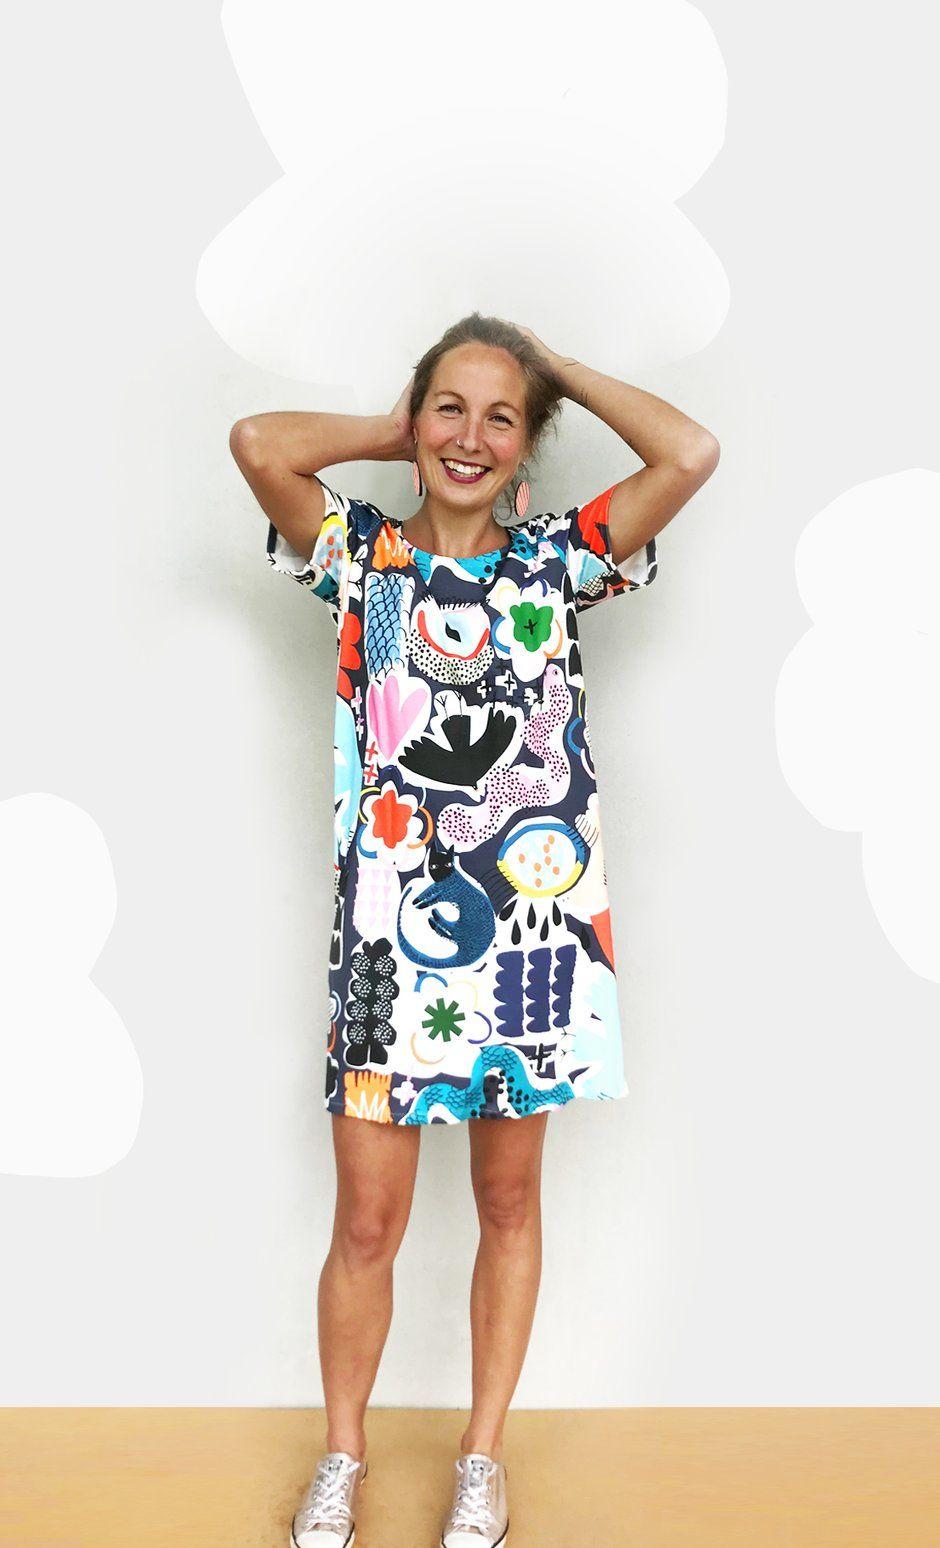 doopsdesigns apparel design inspiration T dress